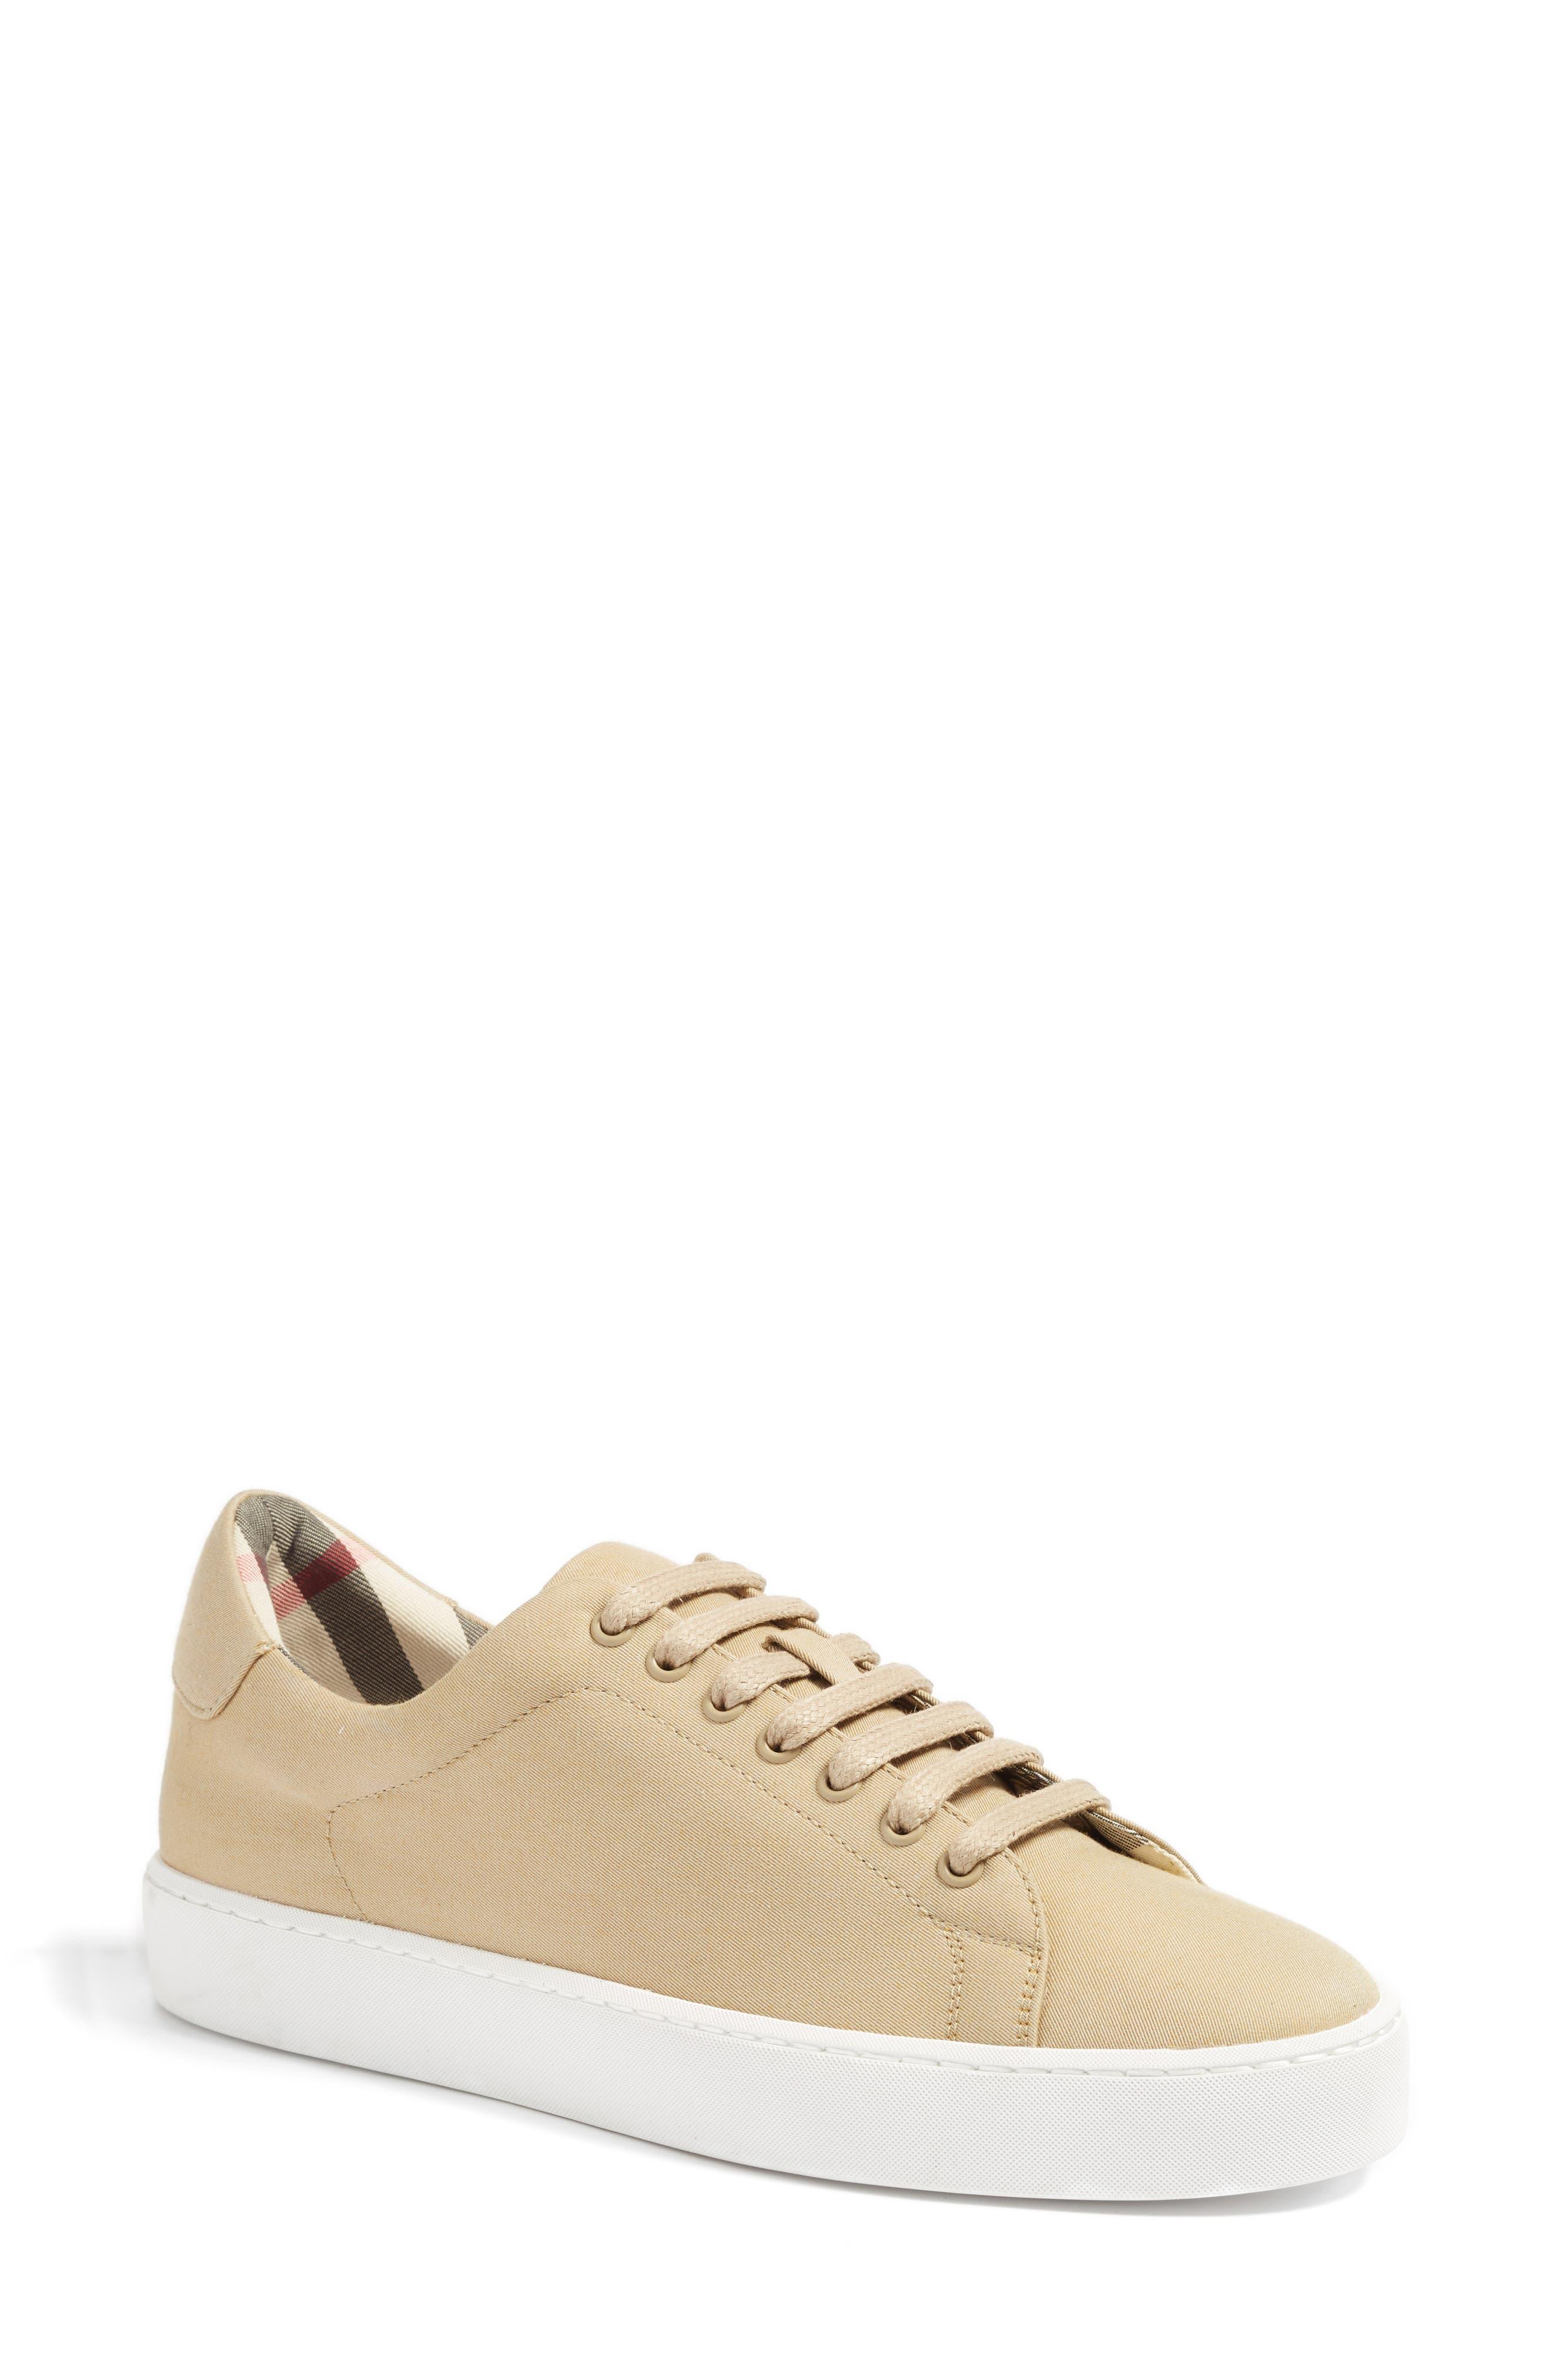 Westford Sneaker,                             Main thumbnail 1, color,                             200